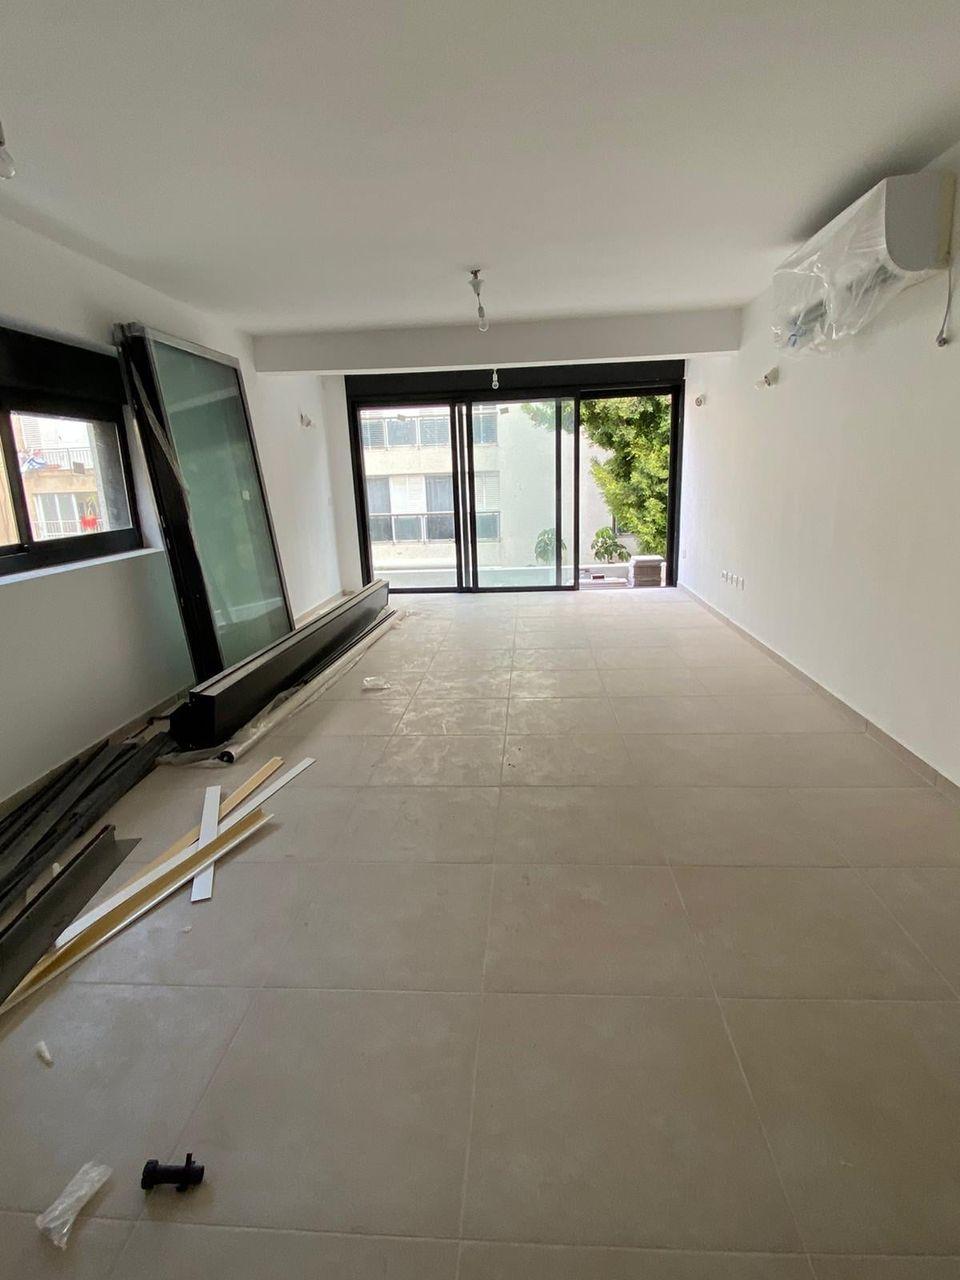 New 3 bedroom Apartment near Bograshov